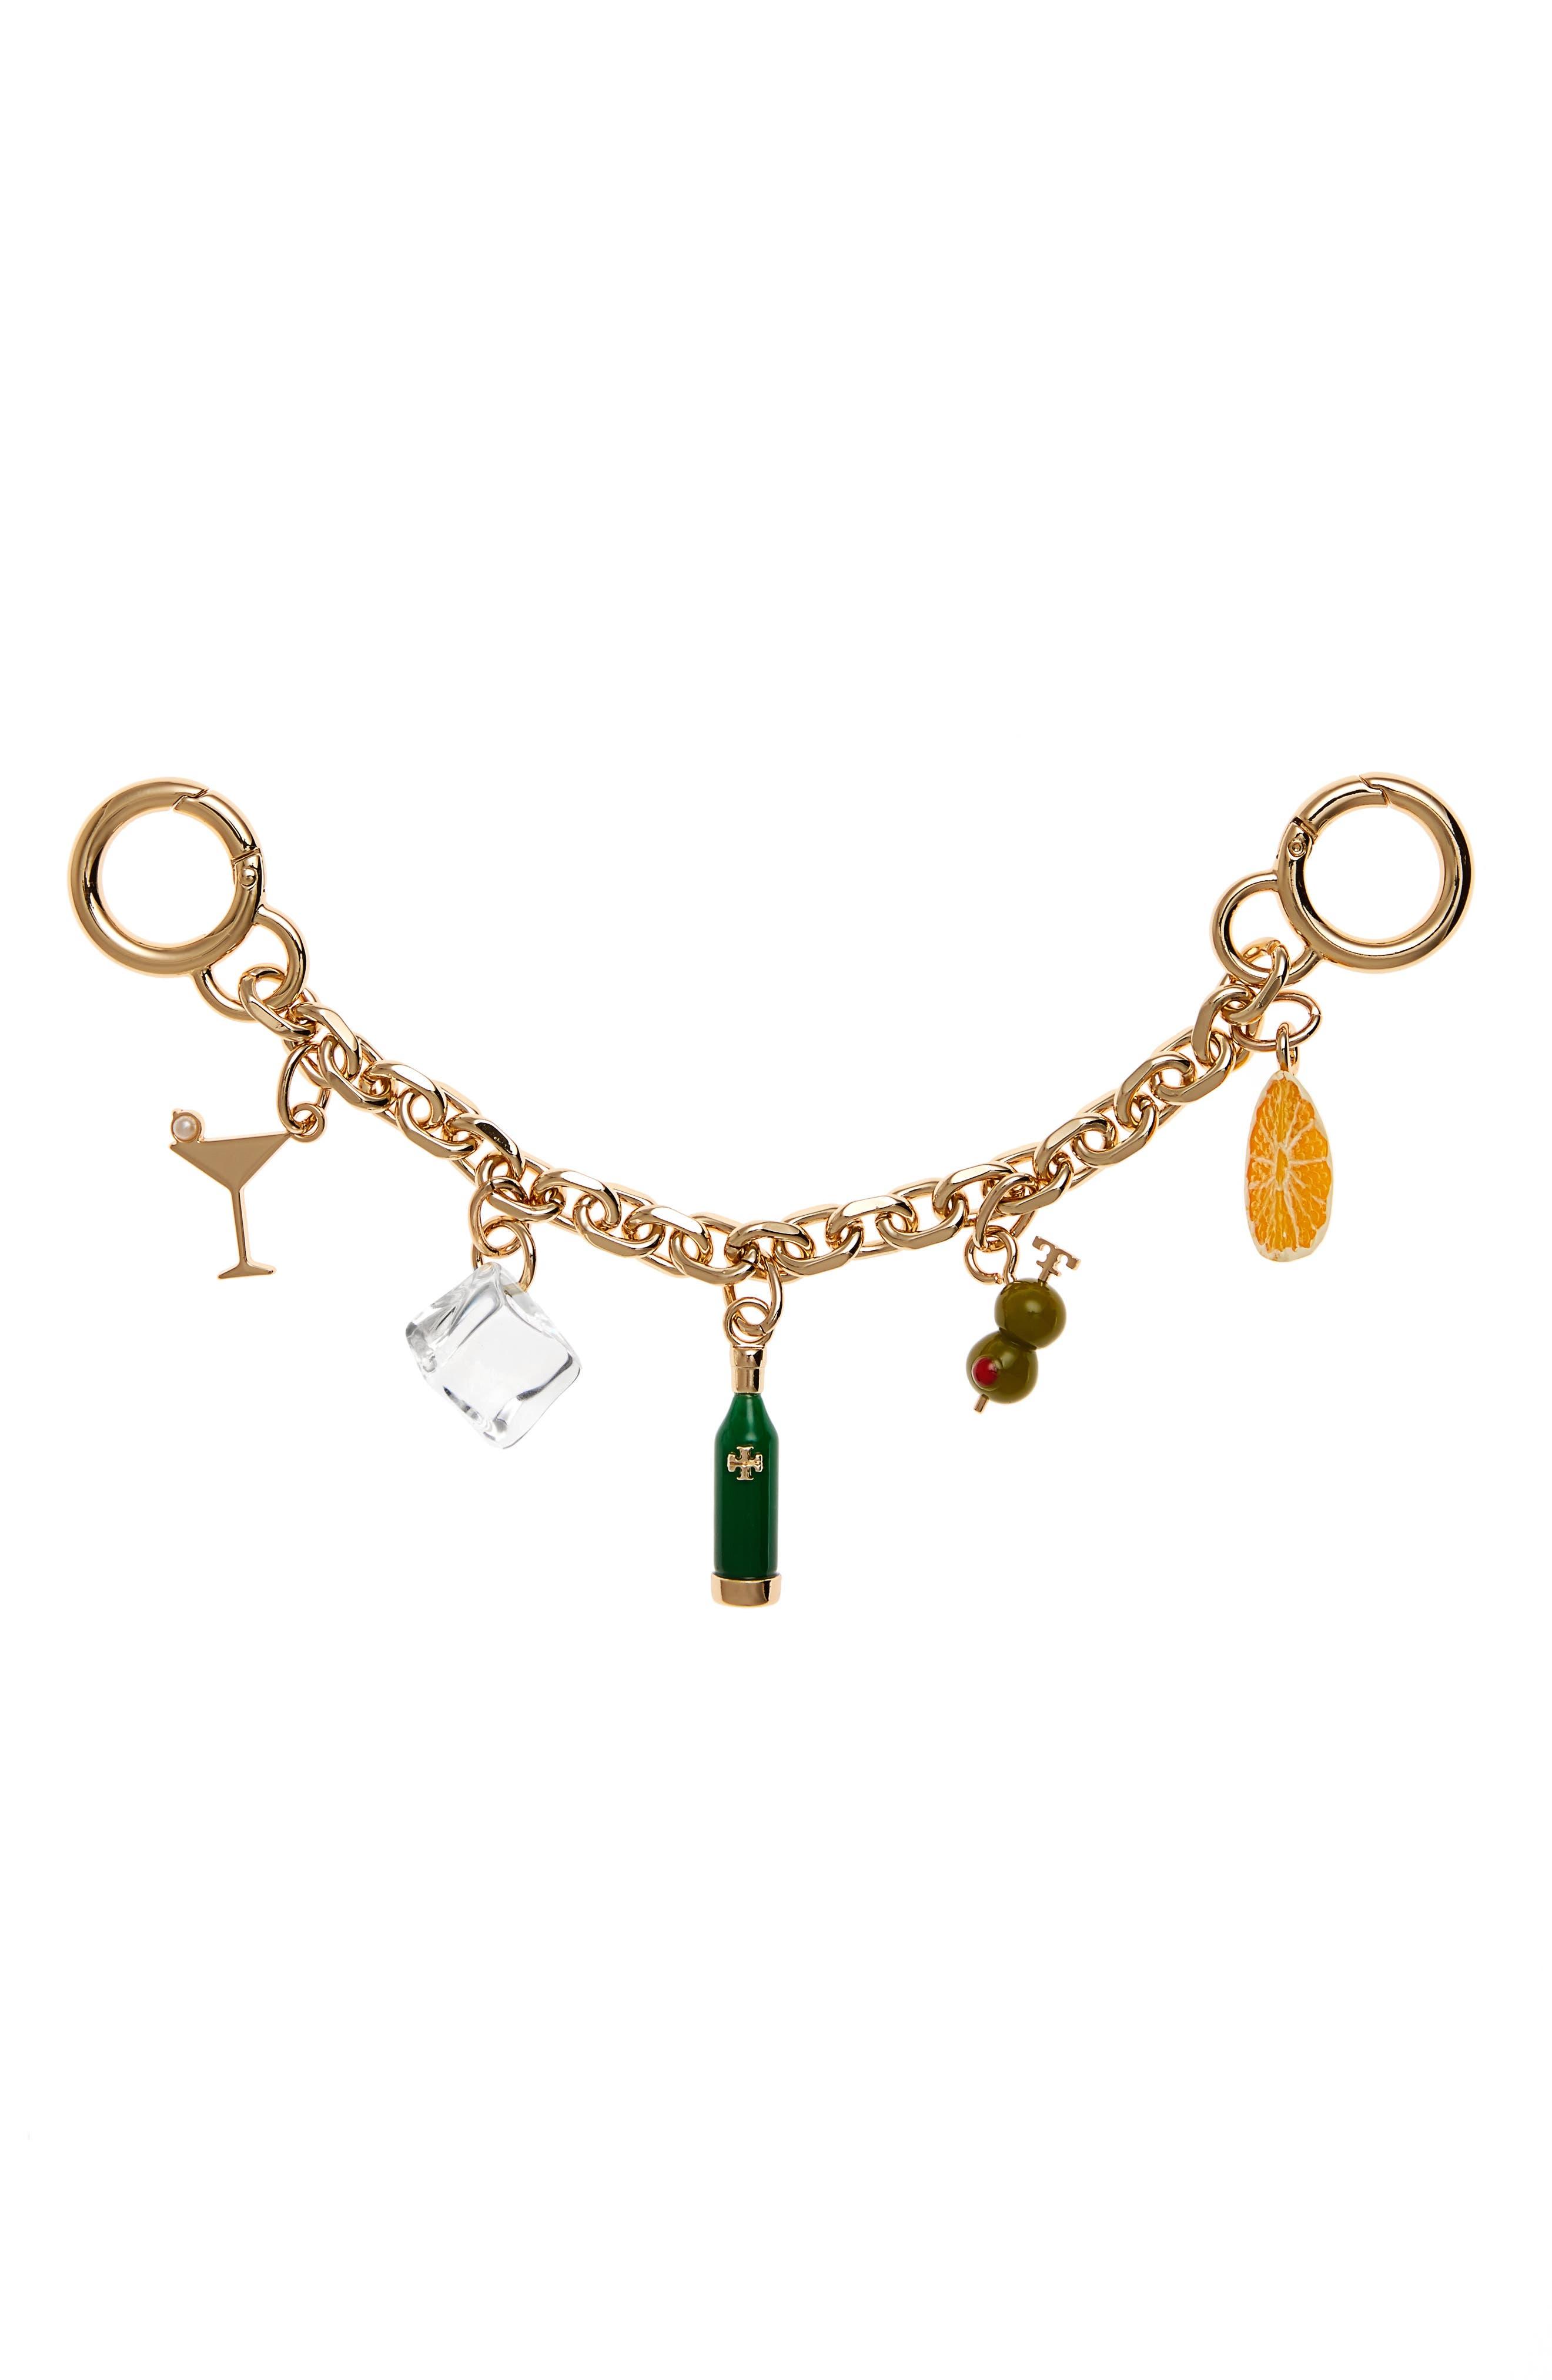 Tory Burch Martini Chain Bag Charm